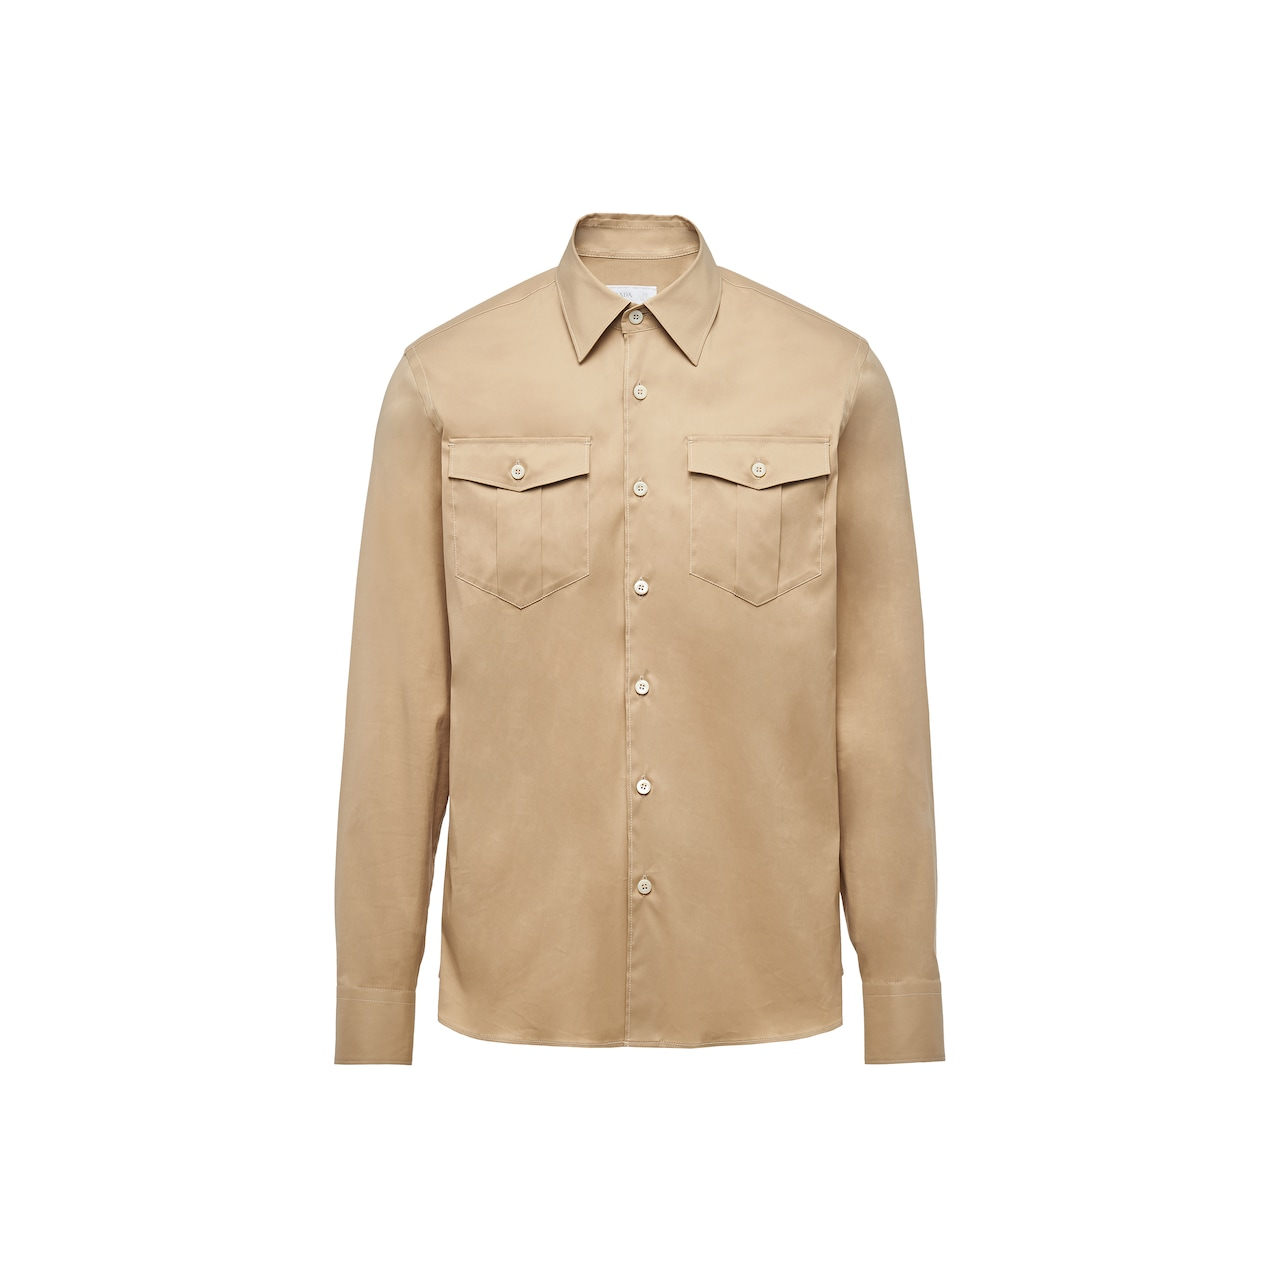 Prada 弹力棉衬衫 1